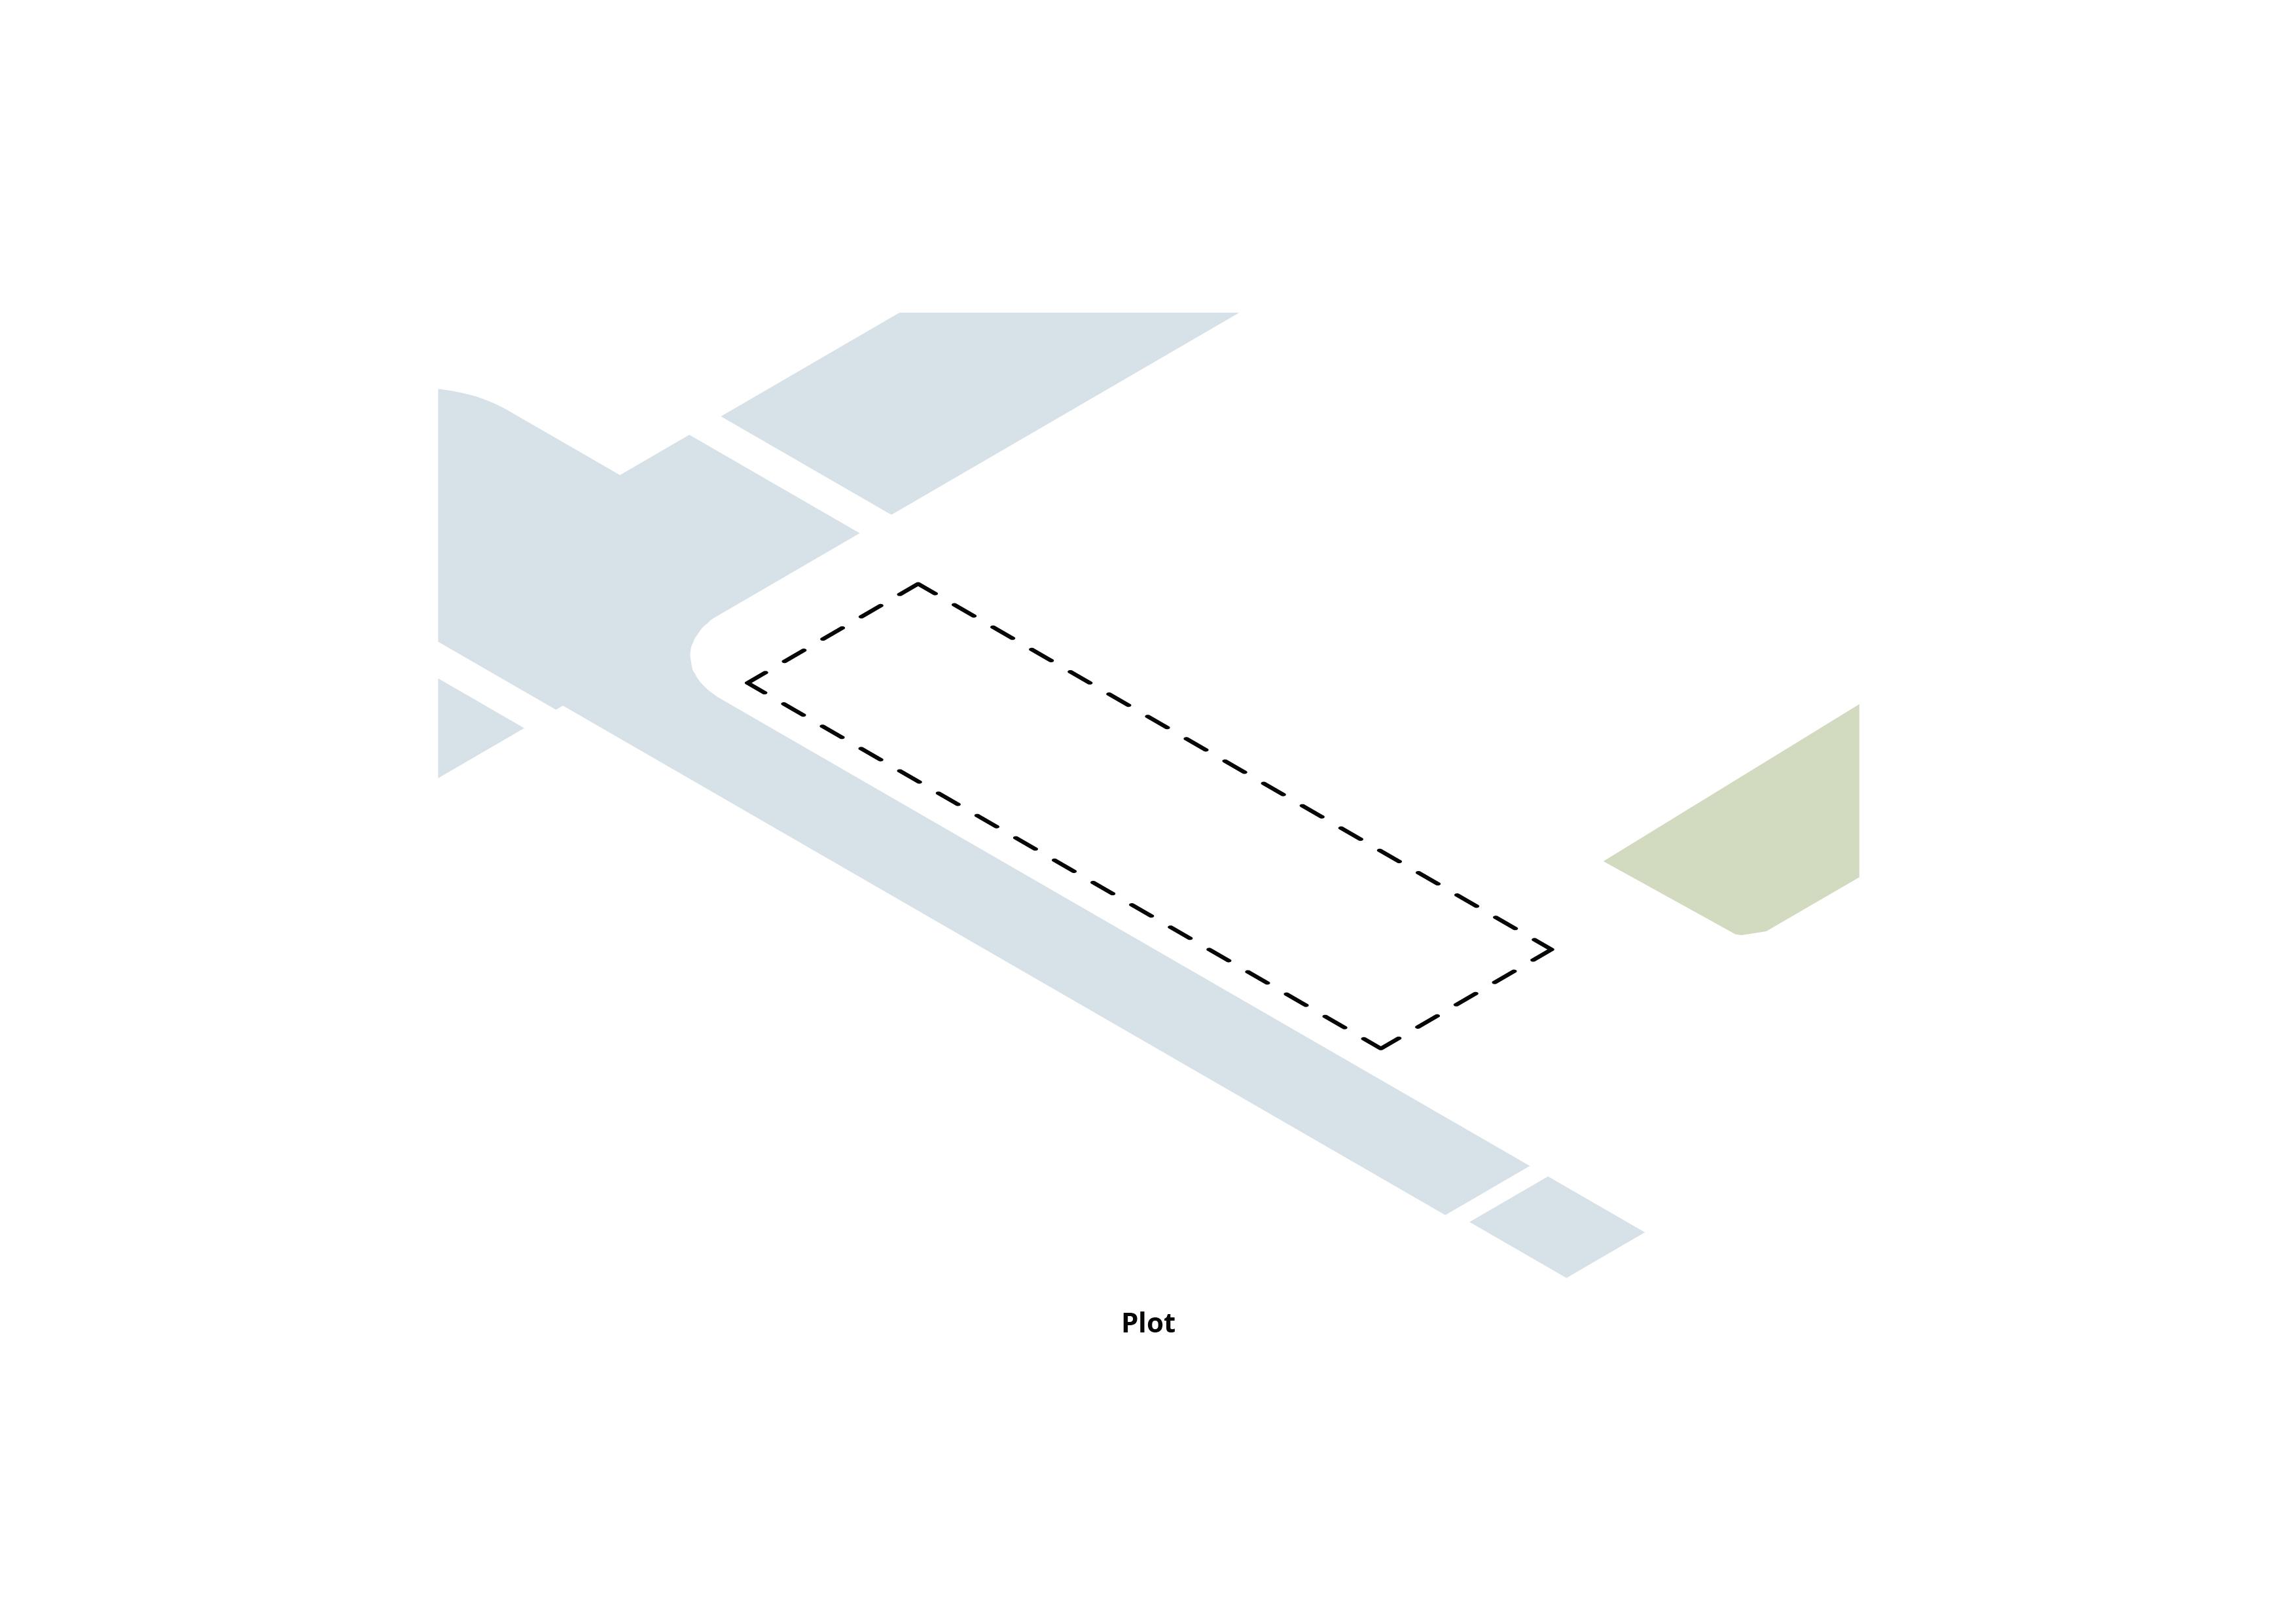 Oosterhamrikzone – Plot